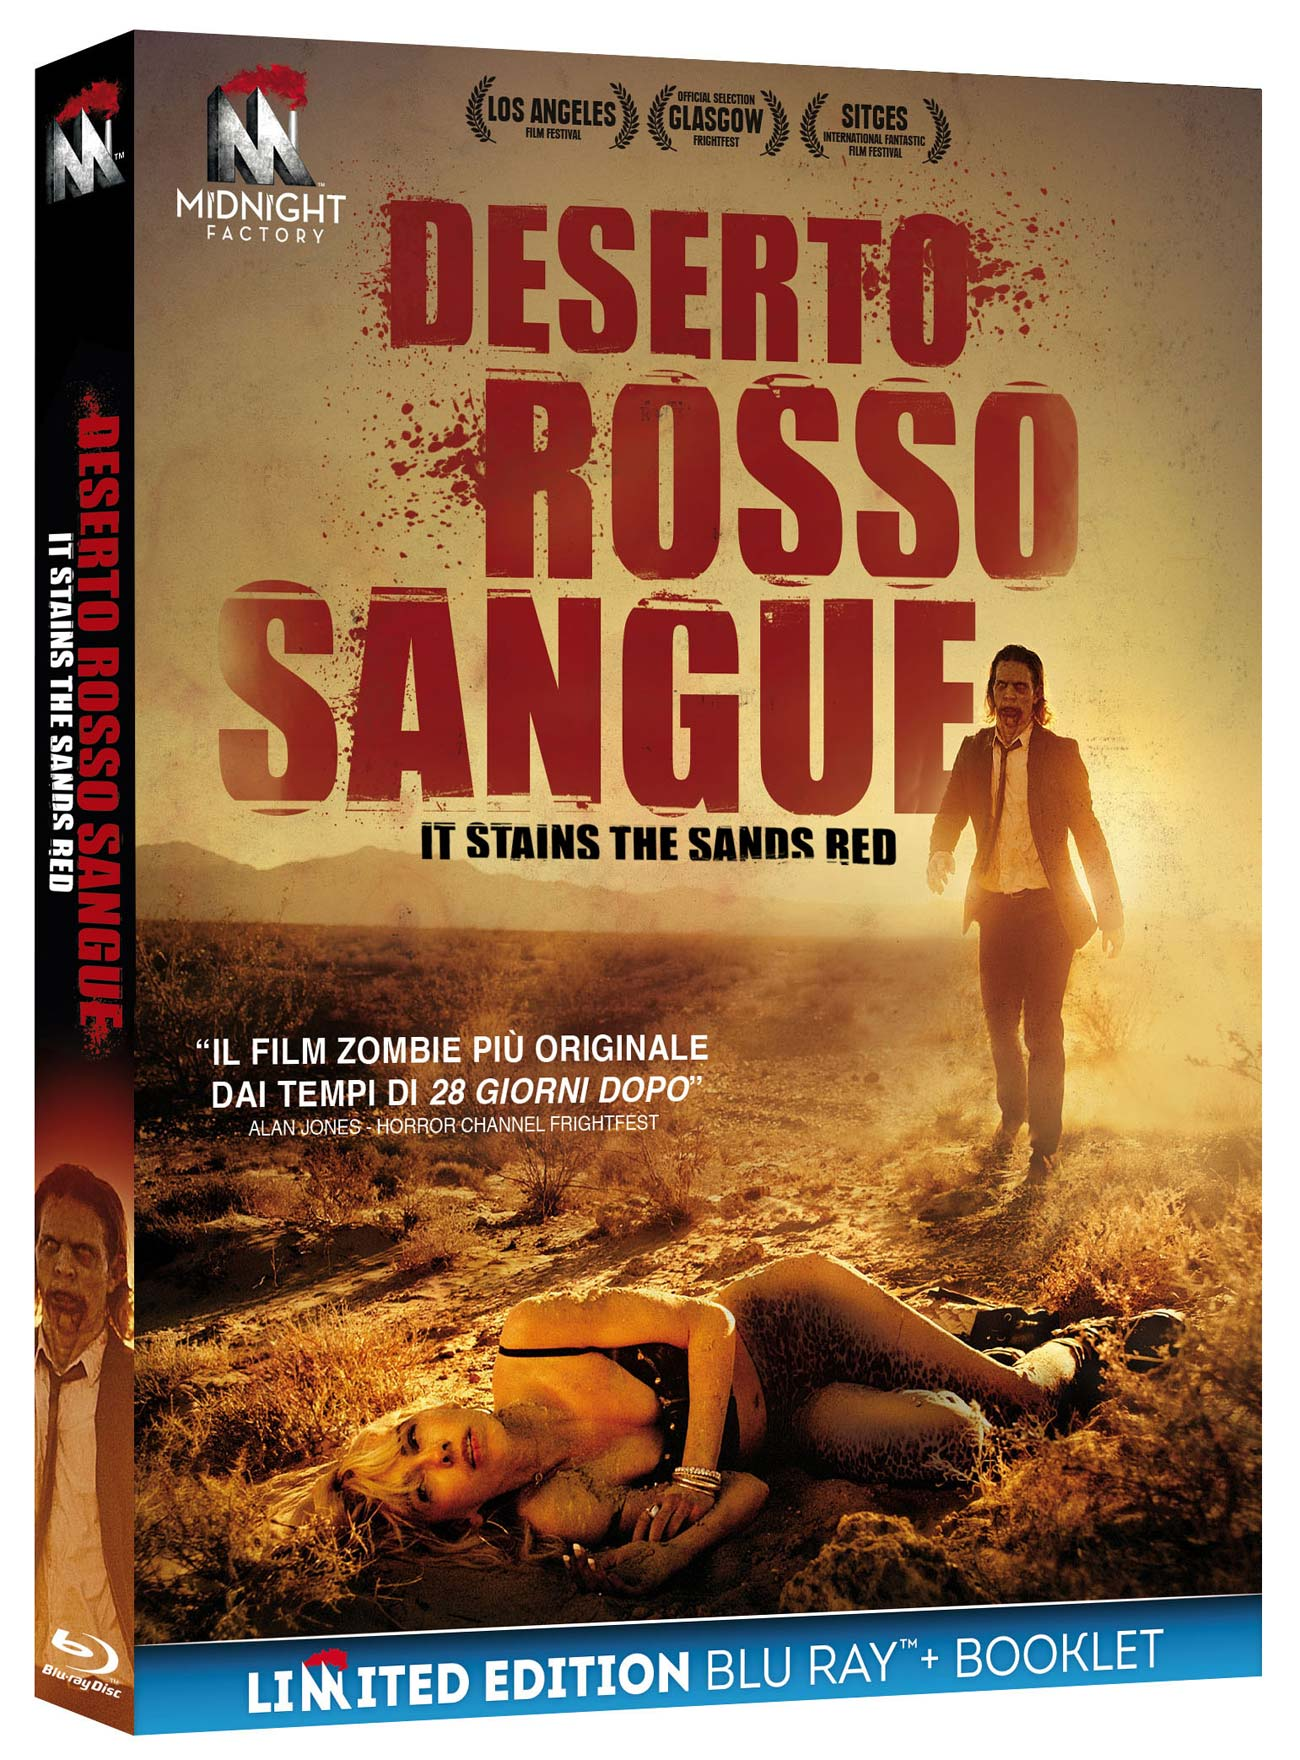 DESERTO ROSSO SANGUE (LTD EDITION) (BLU RAY +BOOKLET)